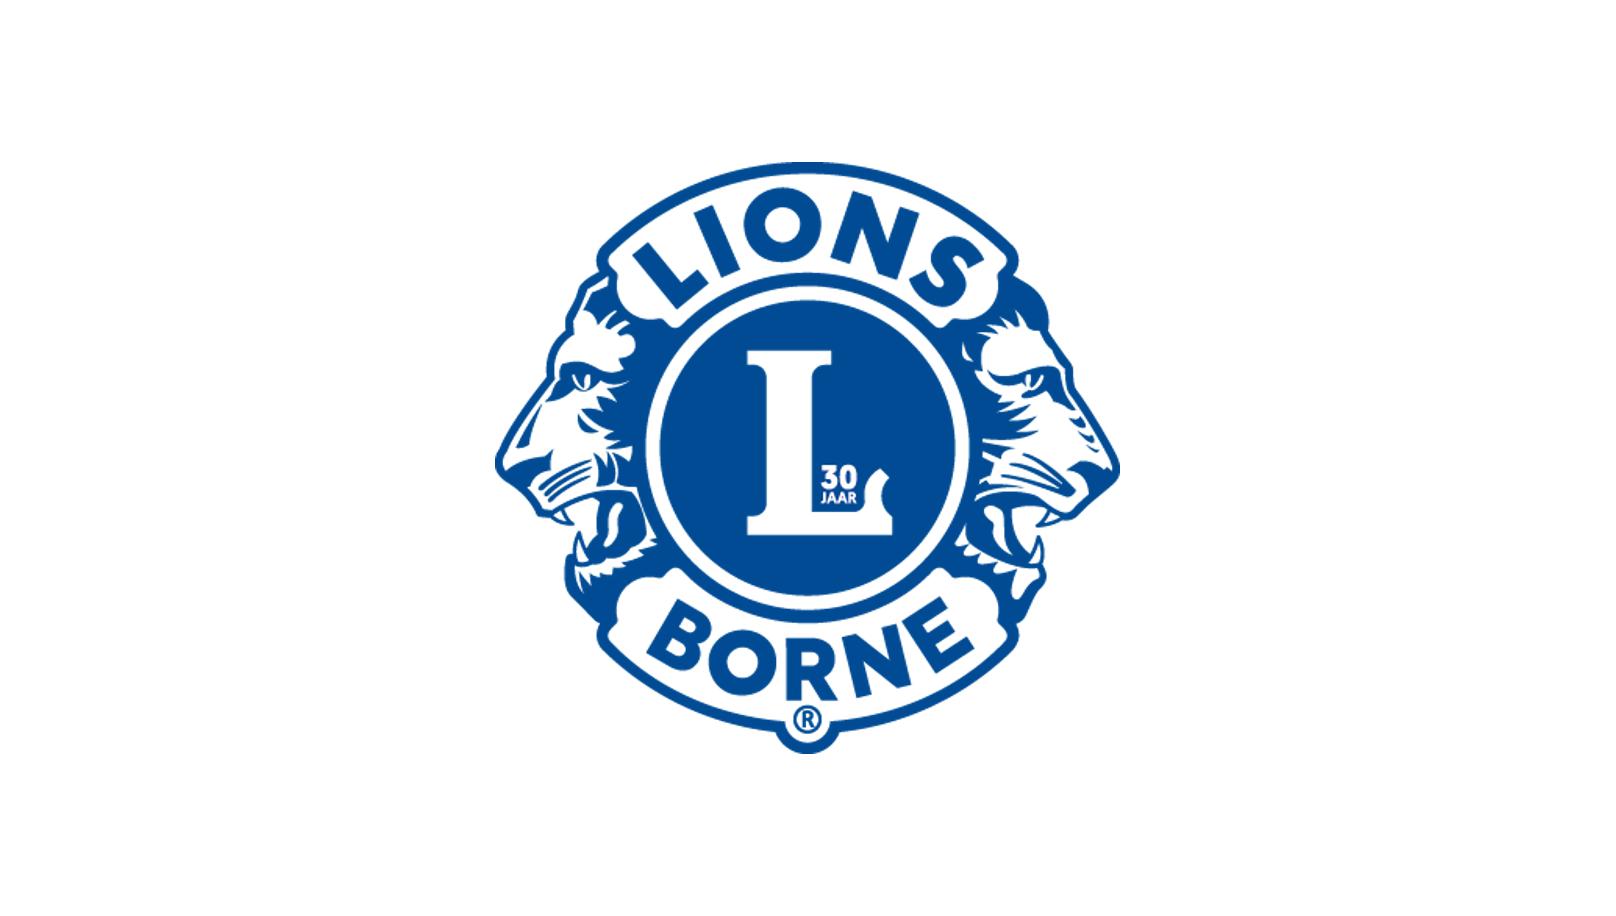 Lions Borne